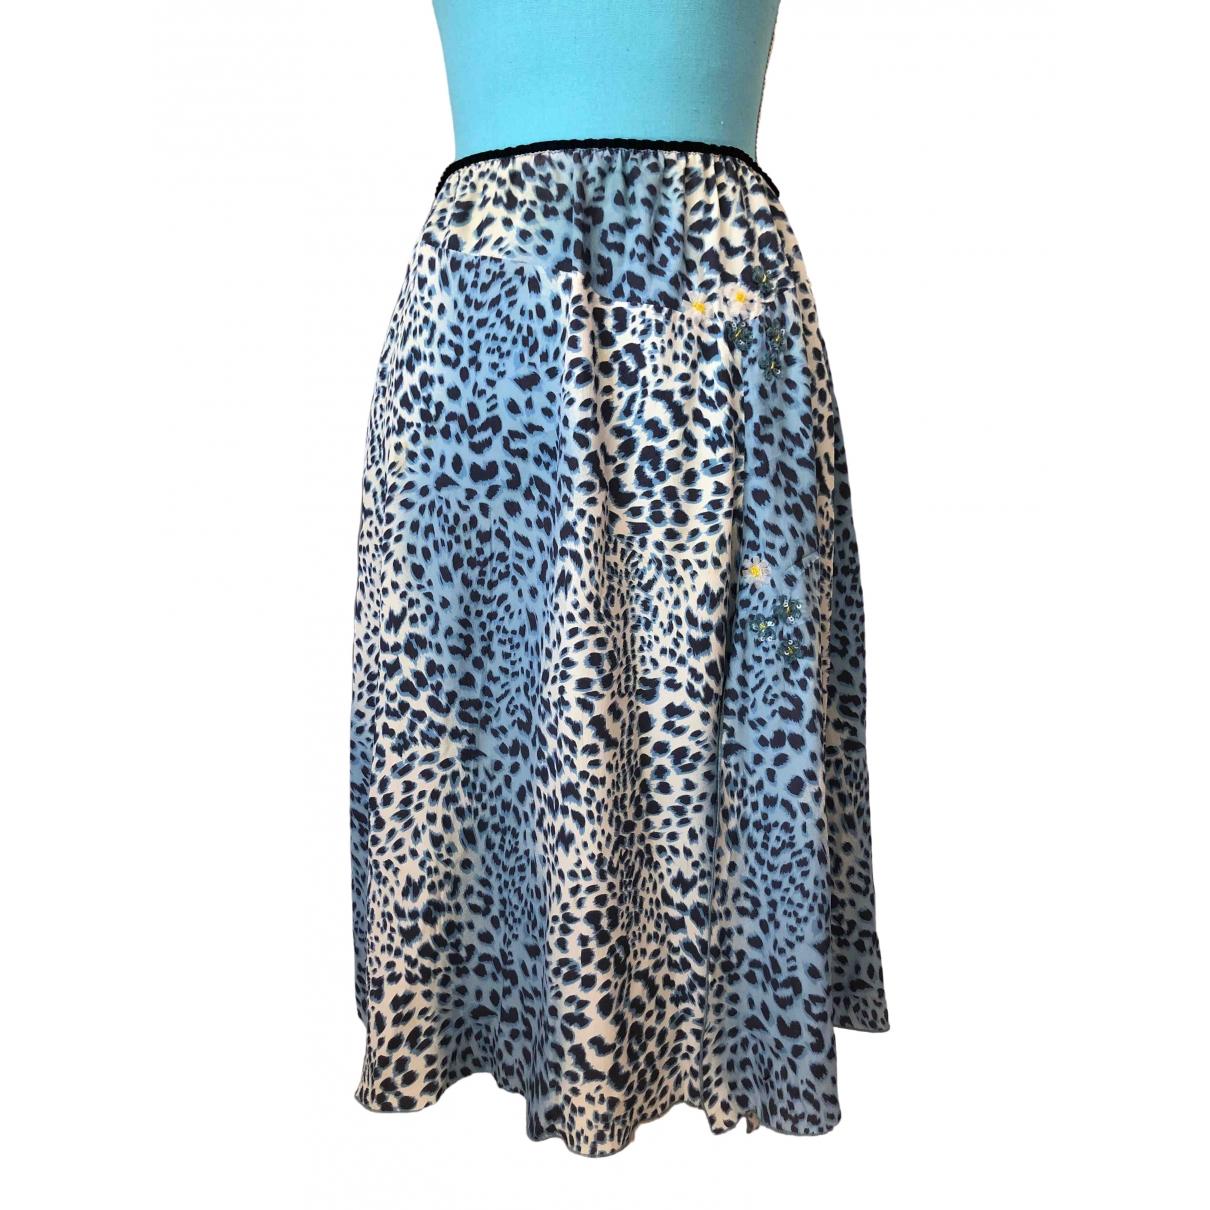 Blumarine \N Blue Silk skirt for Women 40 IT